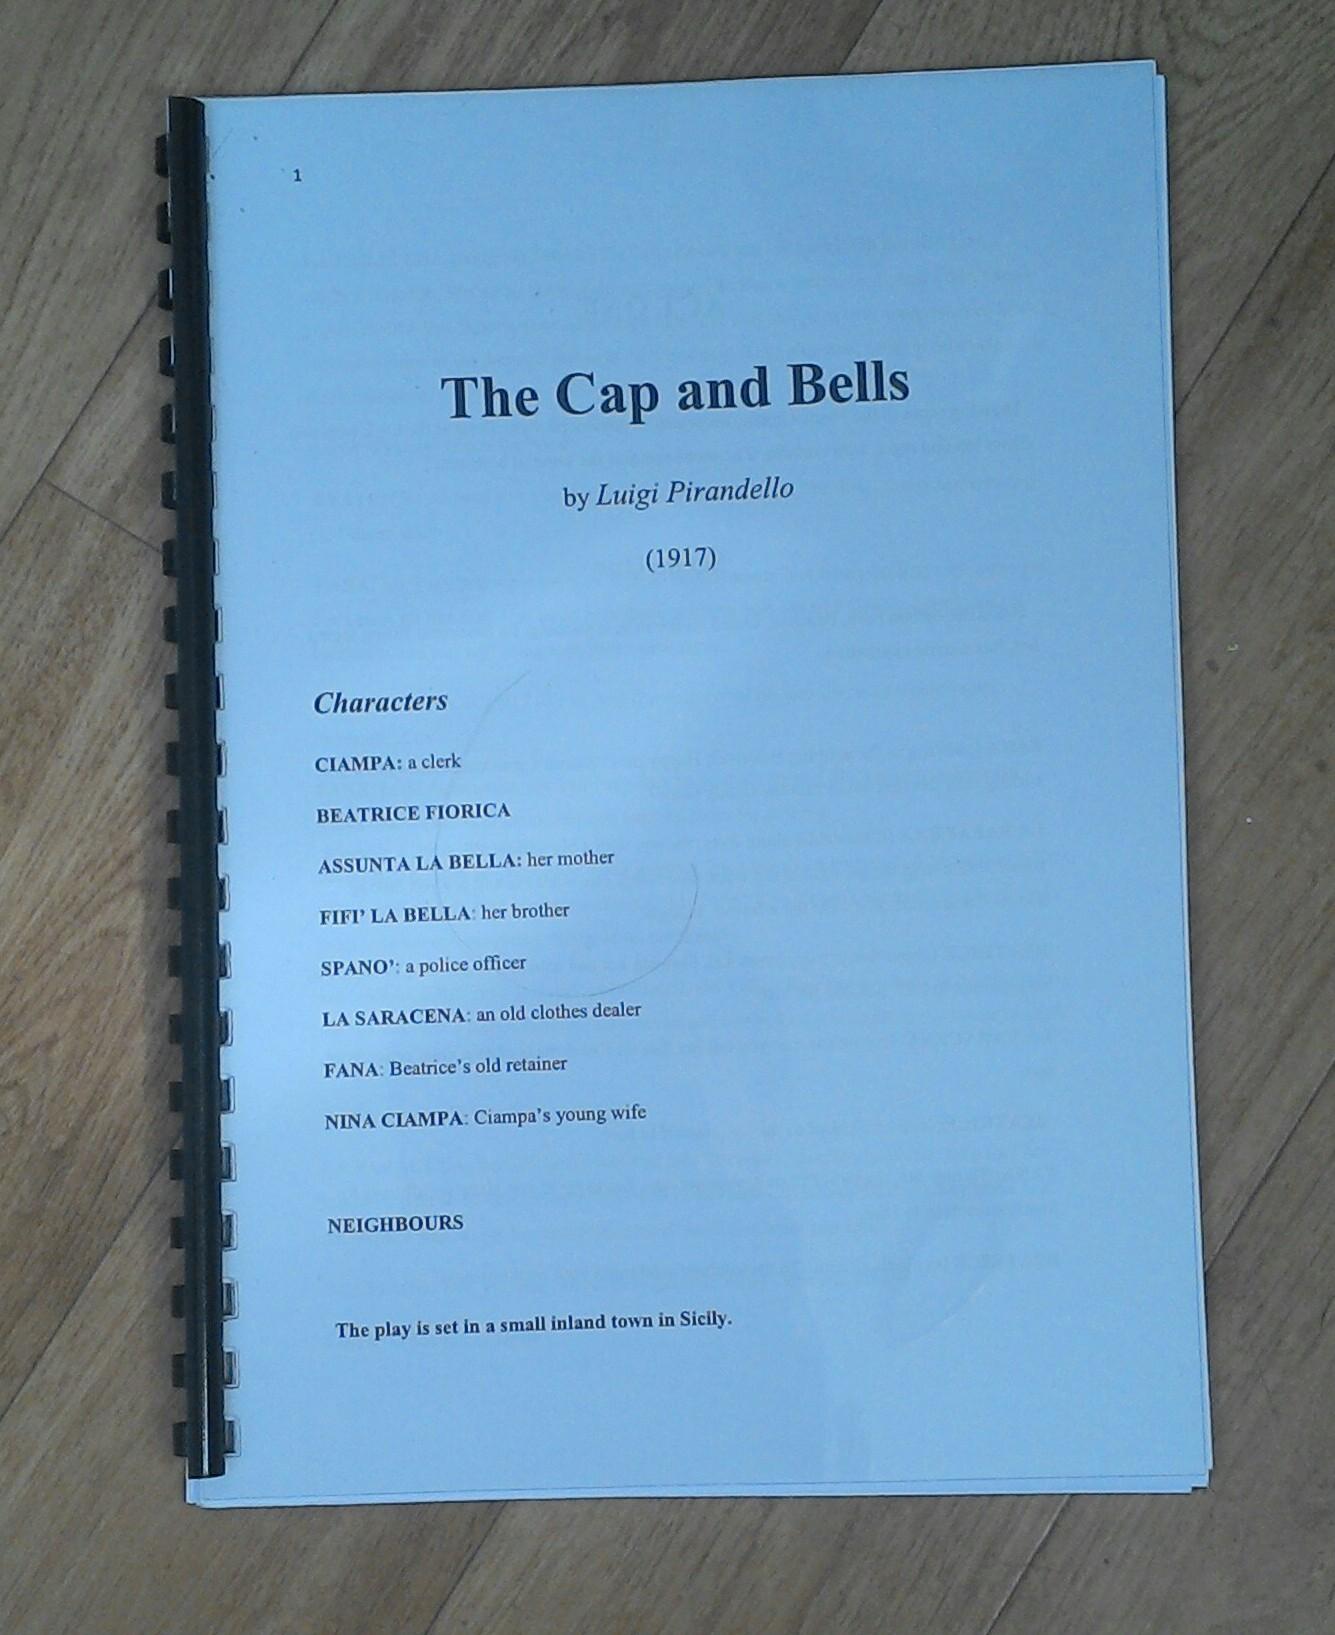 Photo of the Cap and Bells script